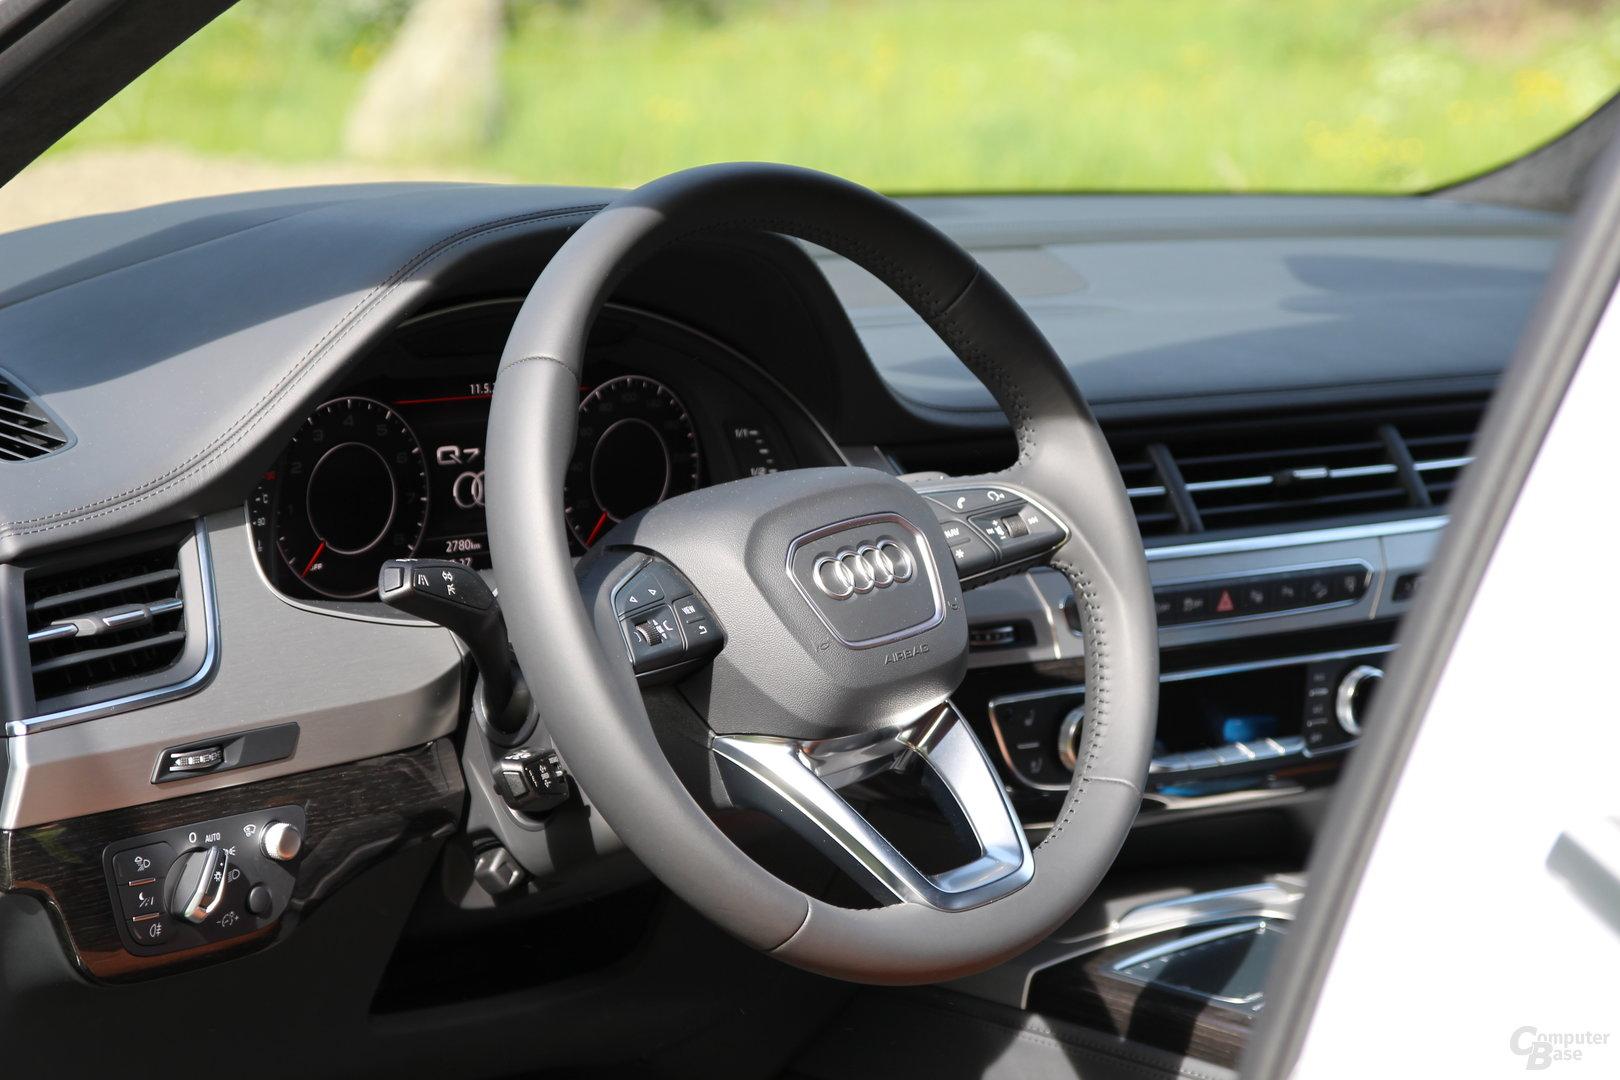 Audi Q7 – Interieur (Bild 37/40) - ComputerBase